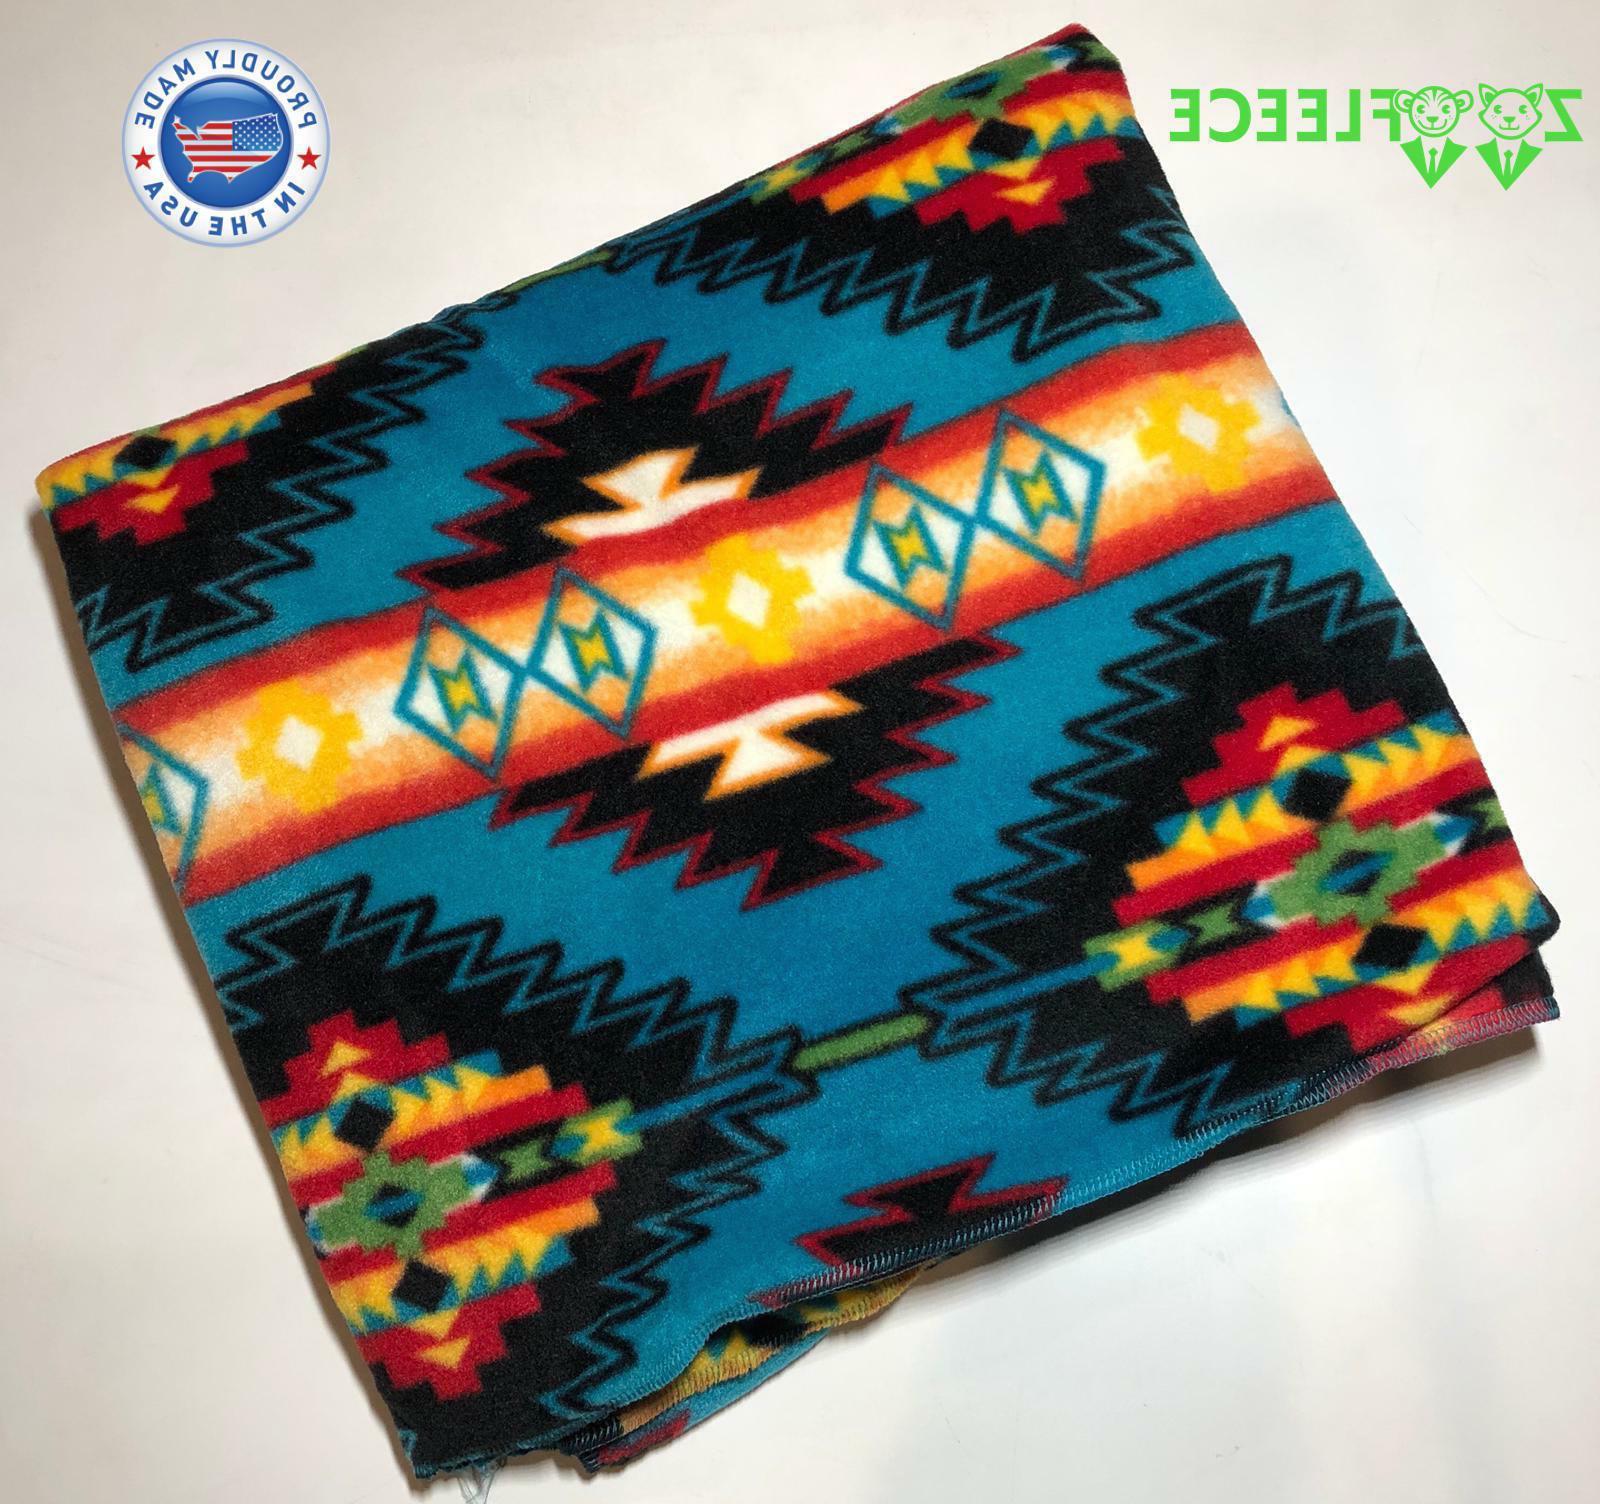 55x60 blue aztec pattern native american blanket